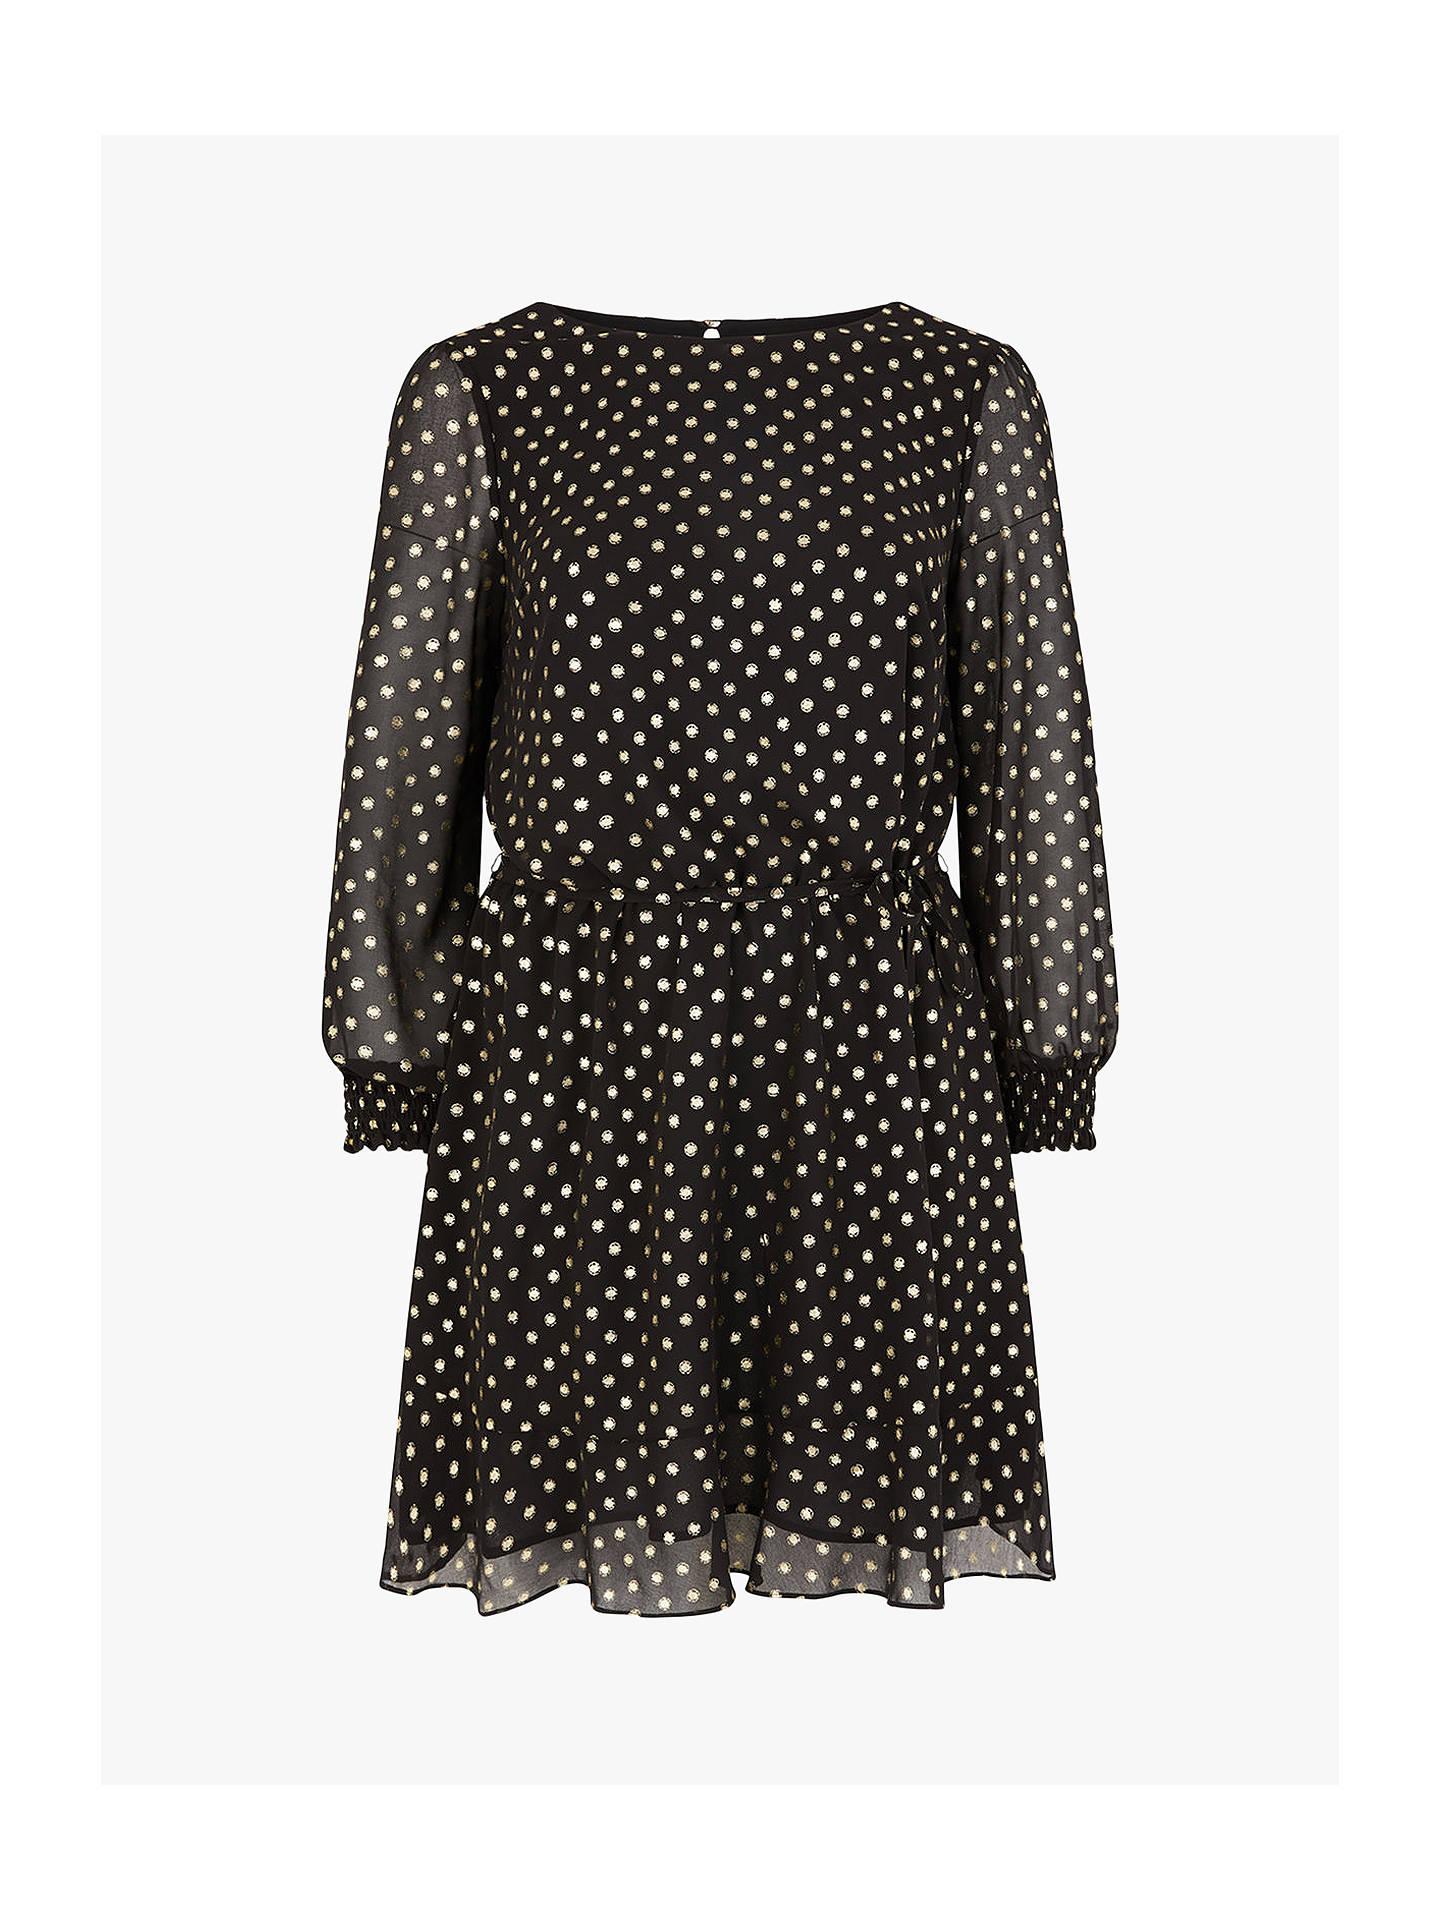 oasis curve chiffon spot dress, black at john lewis & partners